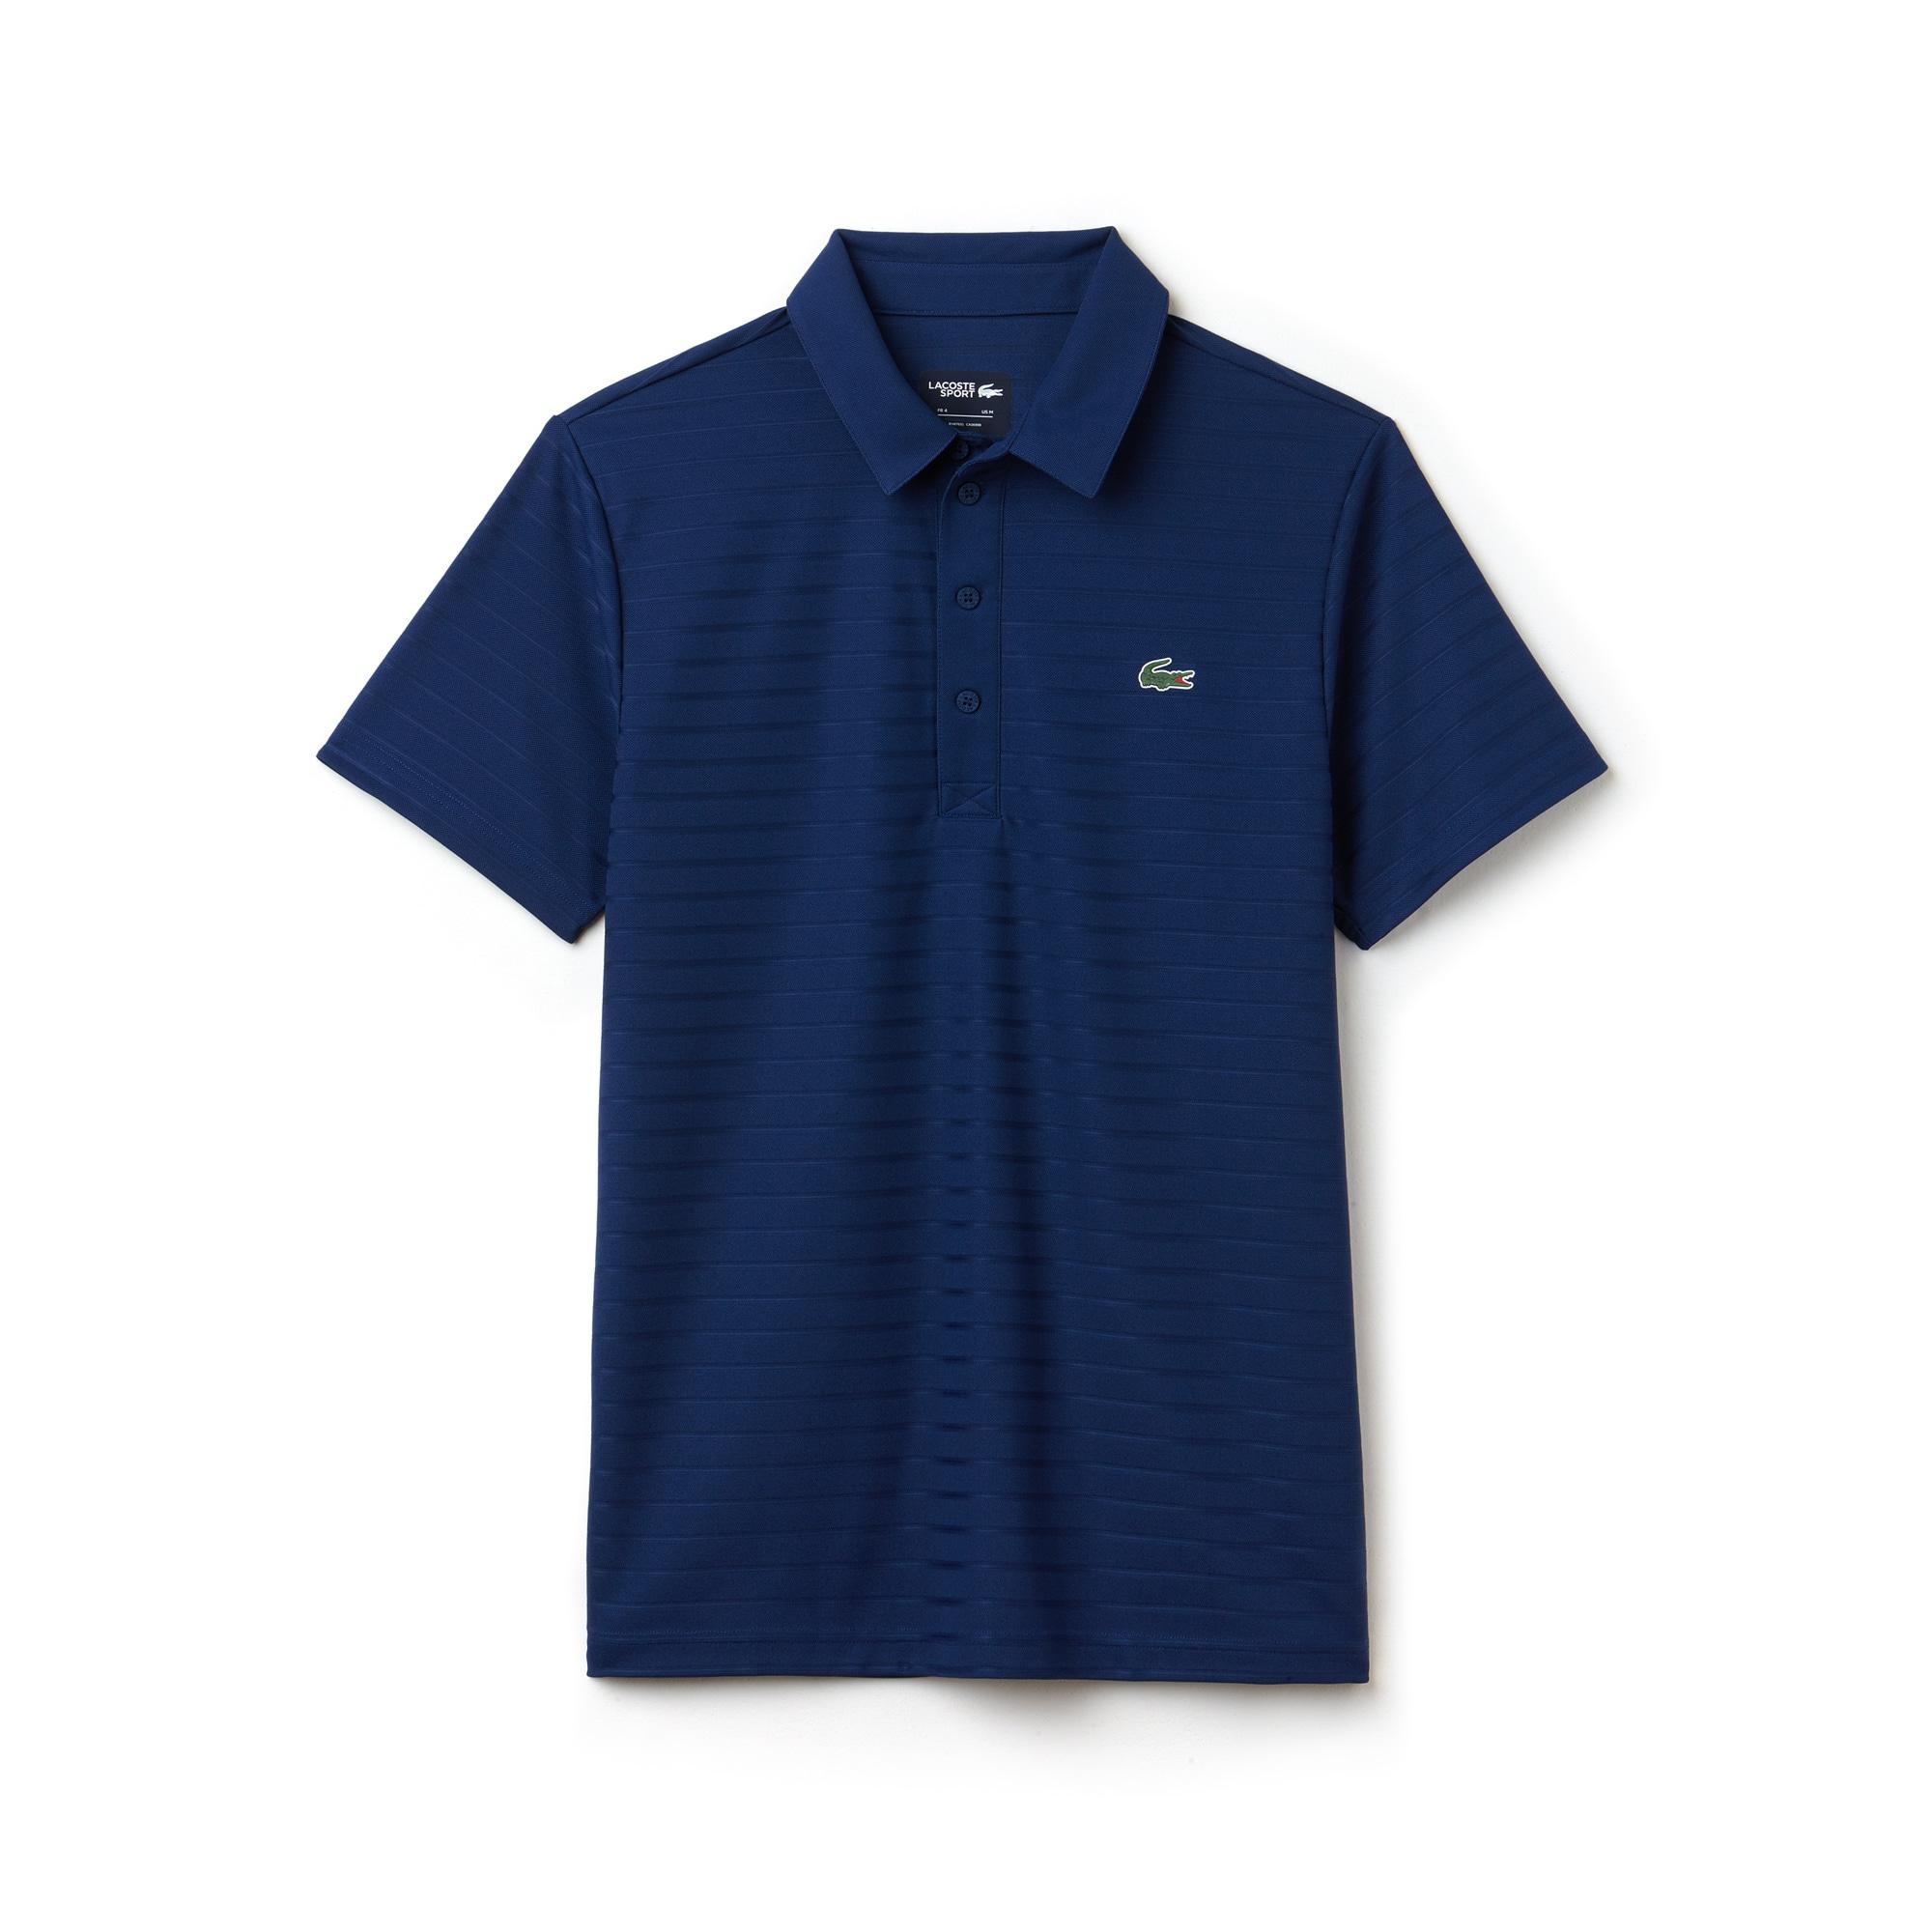 Men's Lacoste SPORT Golf Striped Tech Jacquard Jersey Polo Shirt